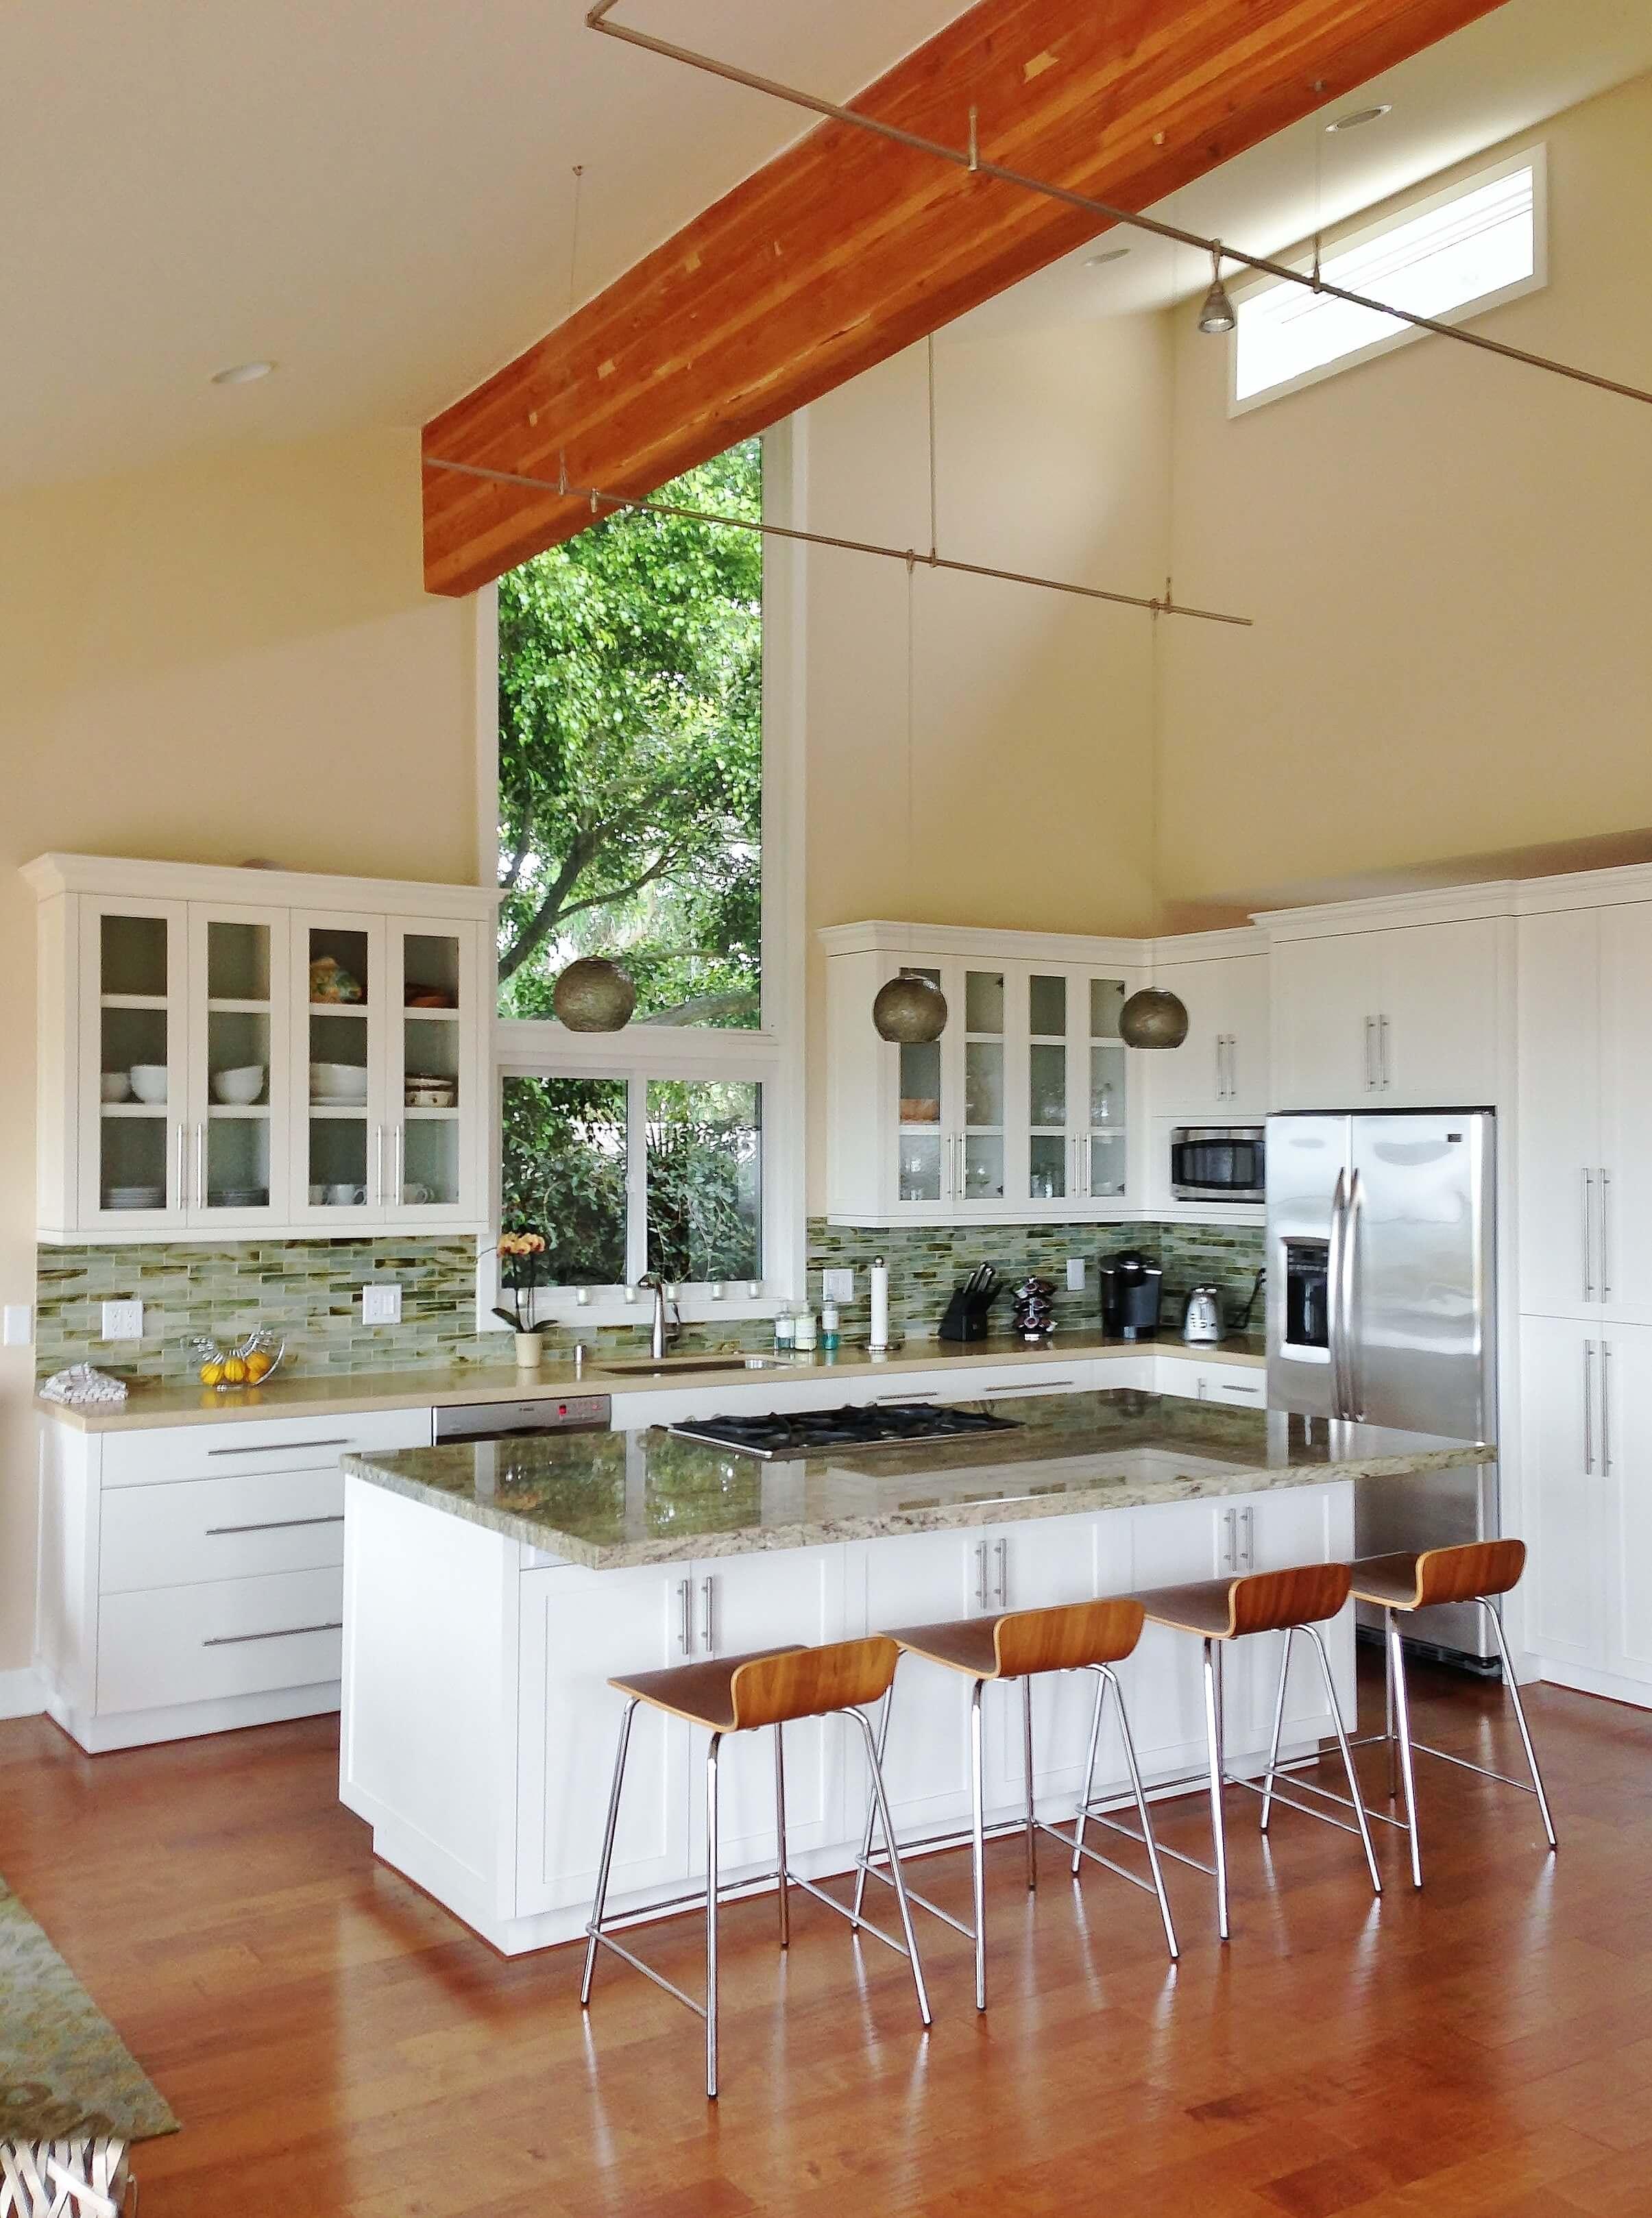 White kitchen cabinets with glass backsplash tile - Ventura California rental house review tour